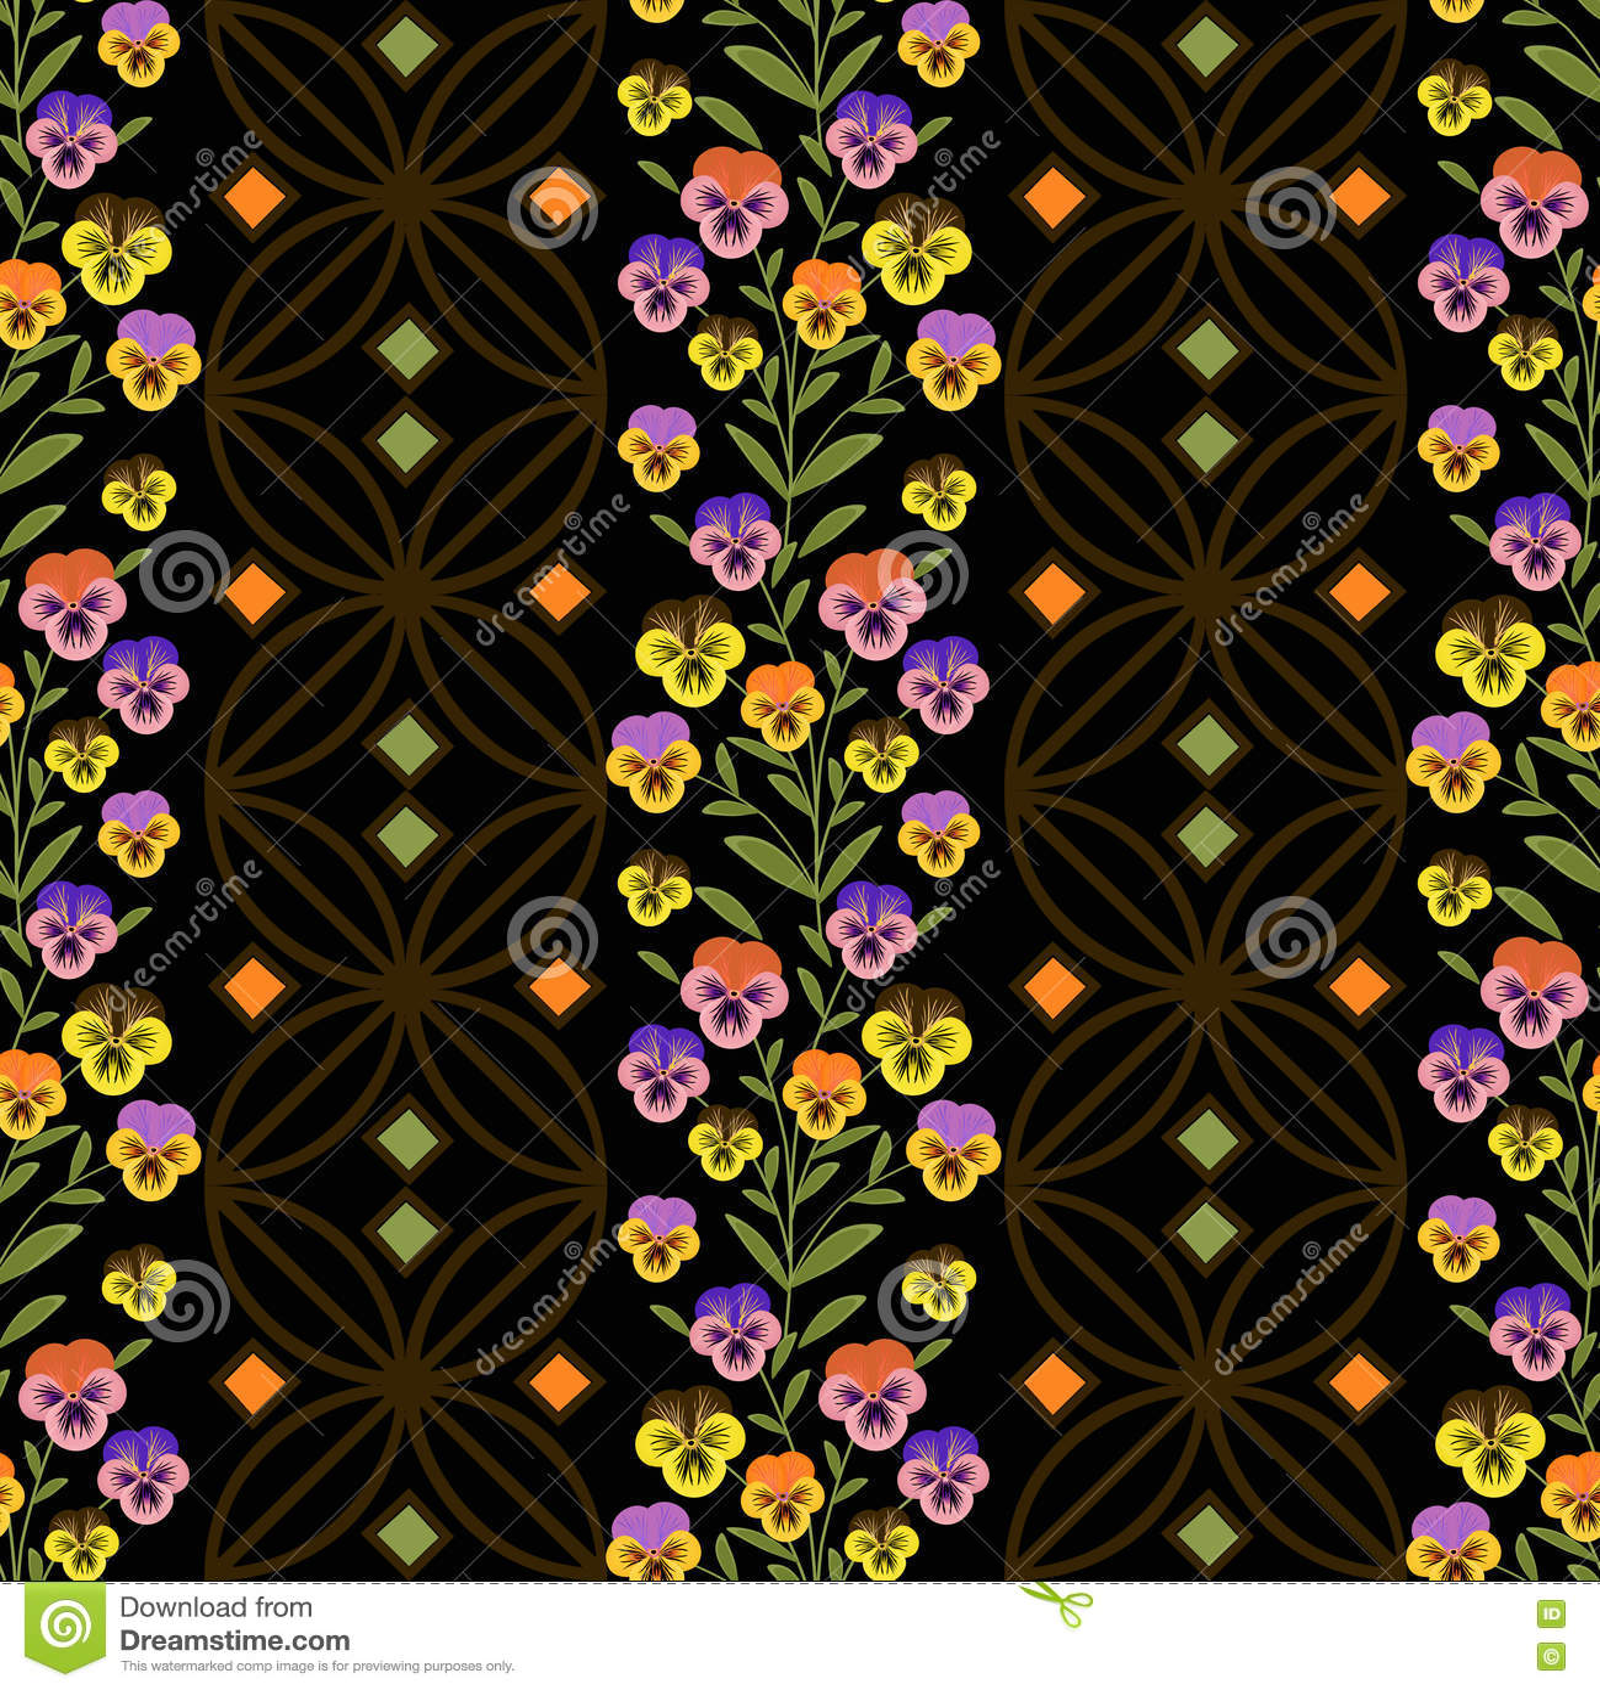 Floral seamless pattern cute cartoon flowers black background floral seamless pattern cute cartoon flowers black background izmirmasajfo